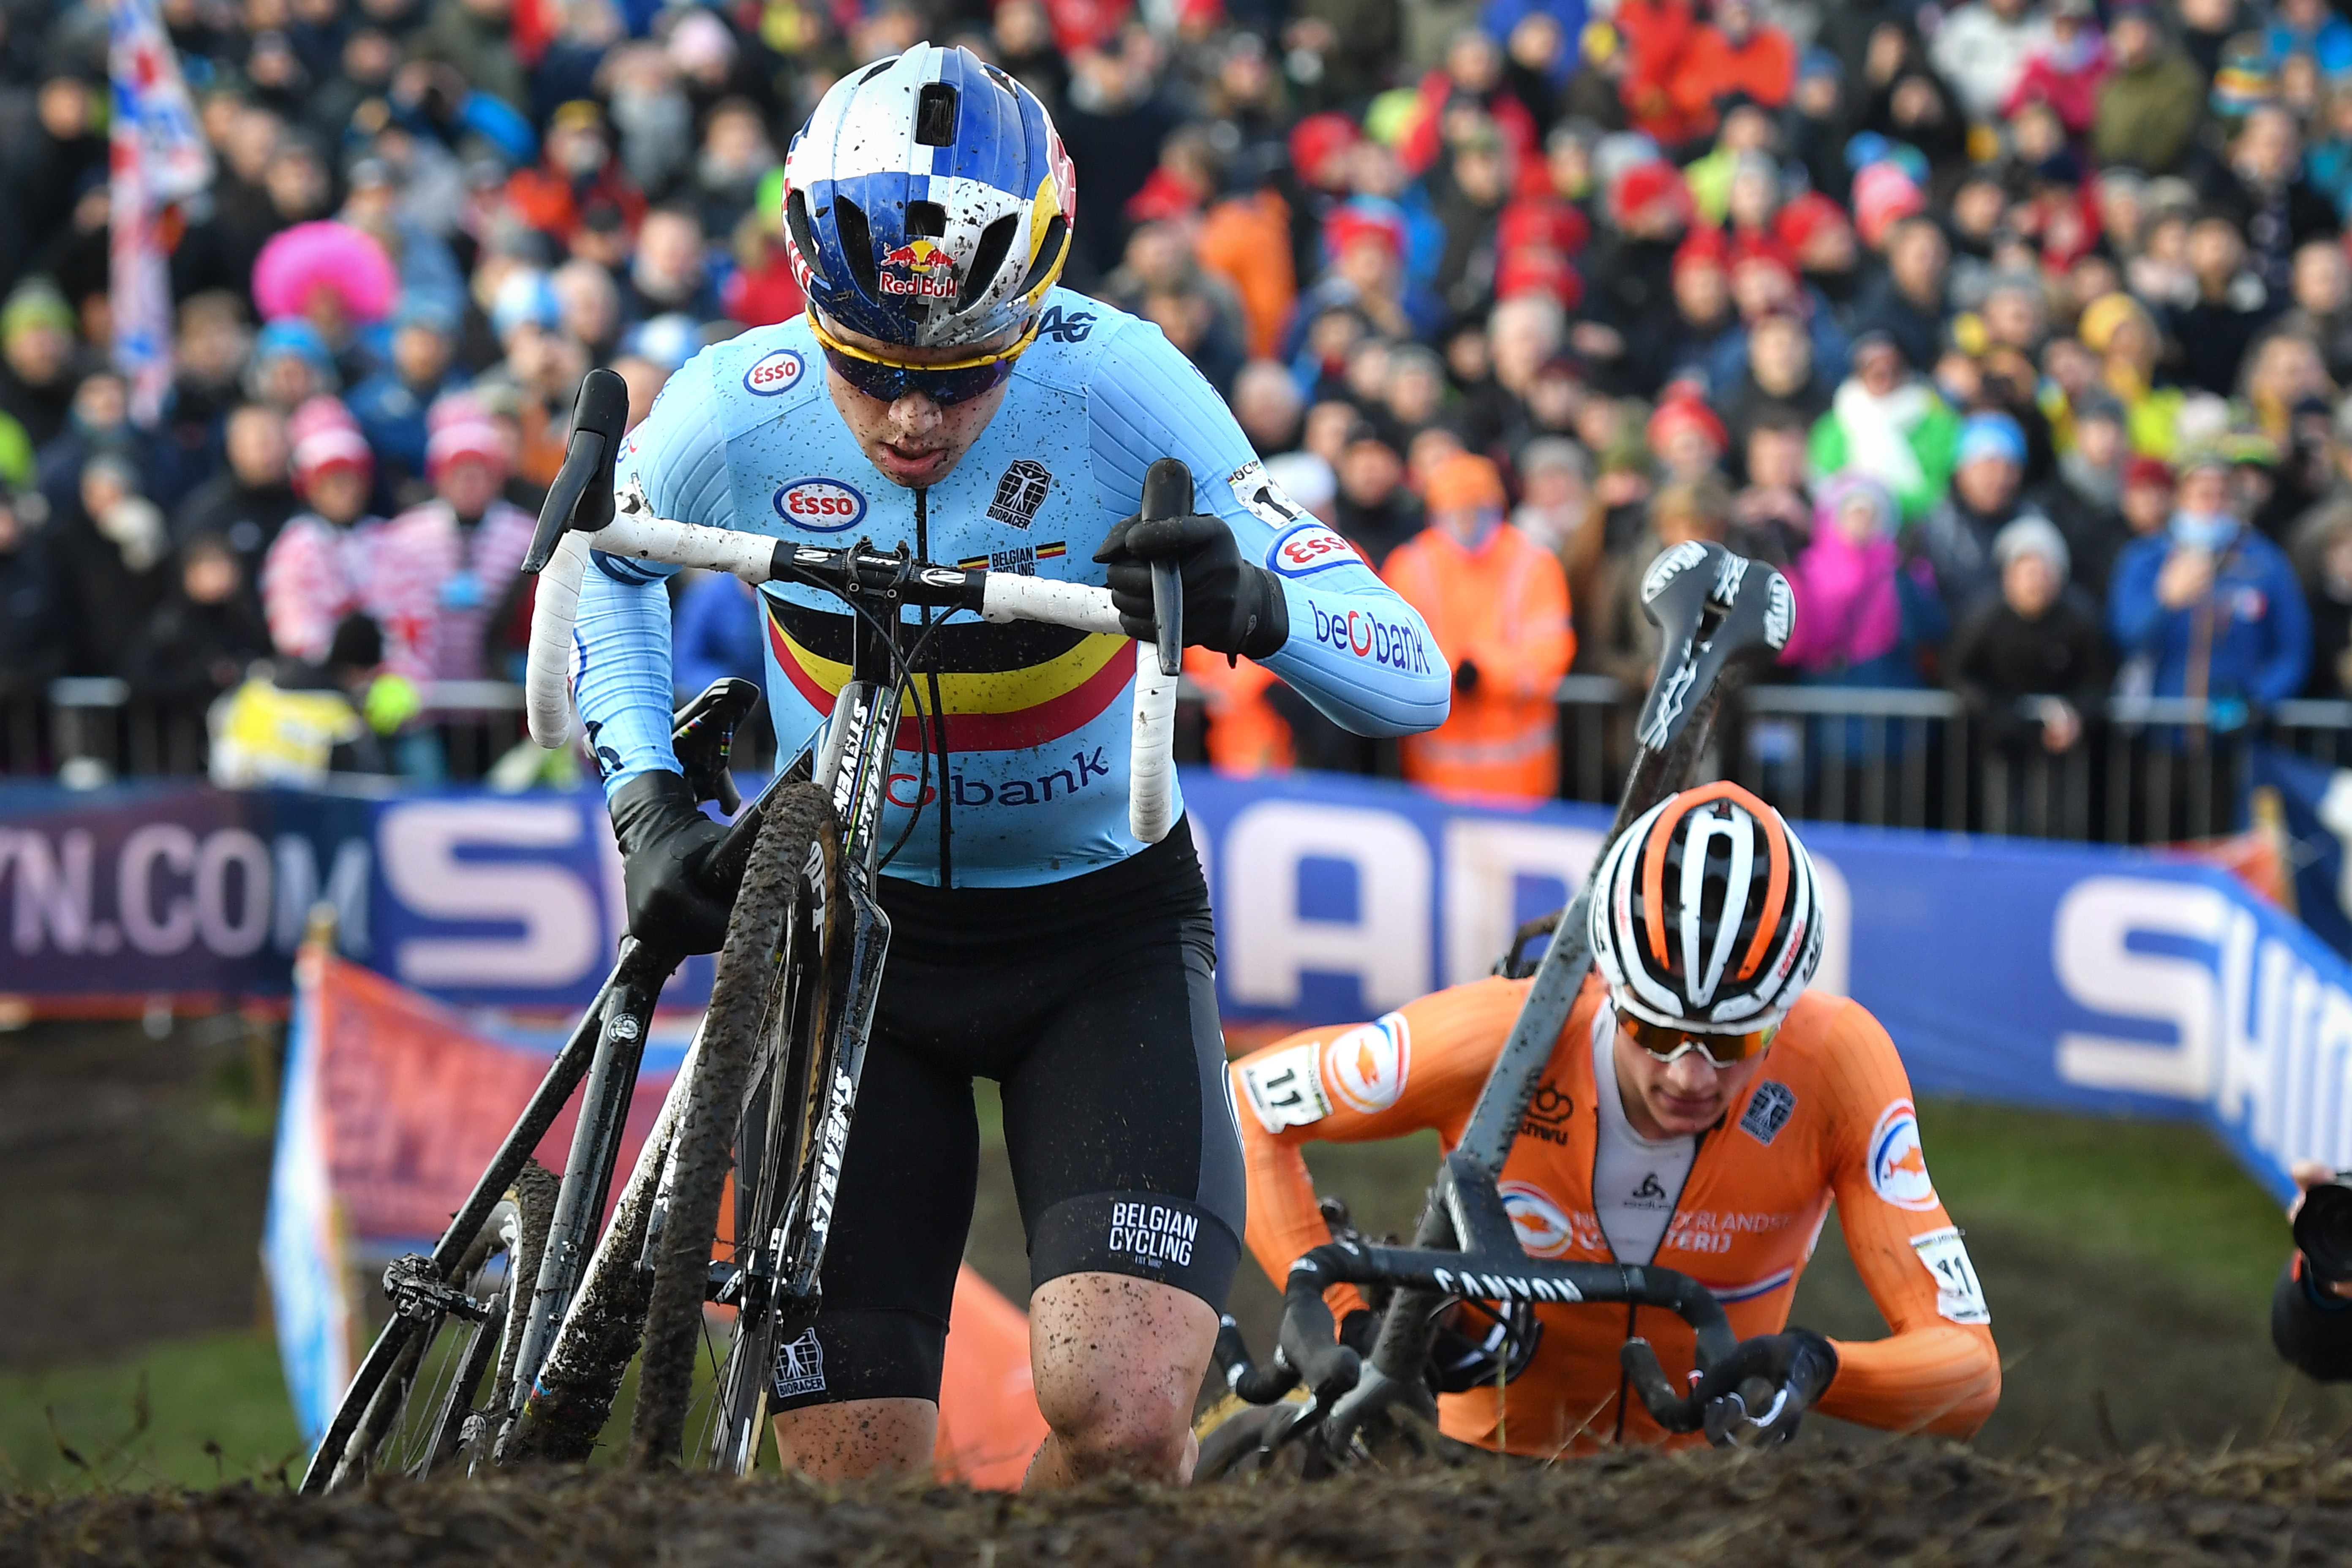 VAN AERT Wout301 - 10 grandes protagonistas del ciclocross 2020-21